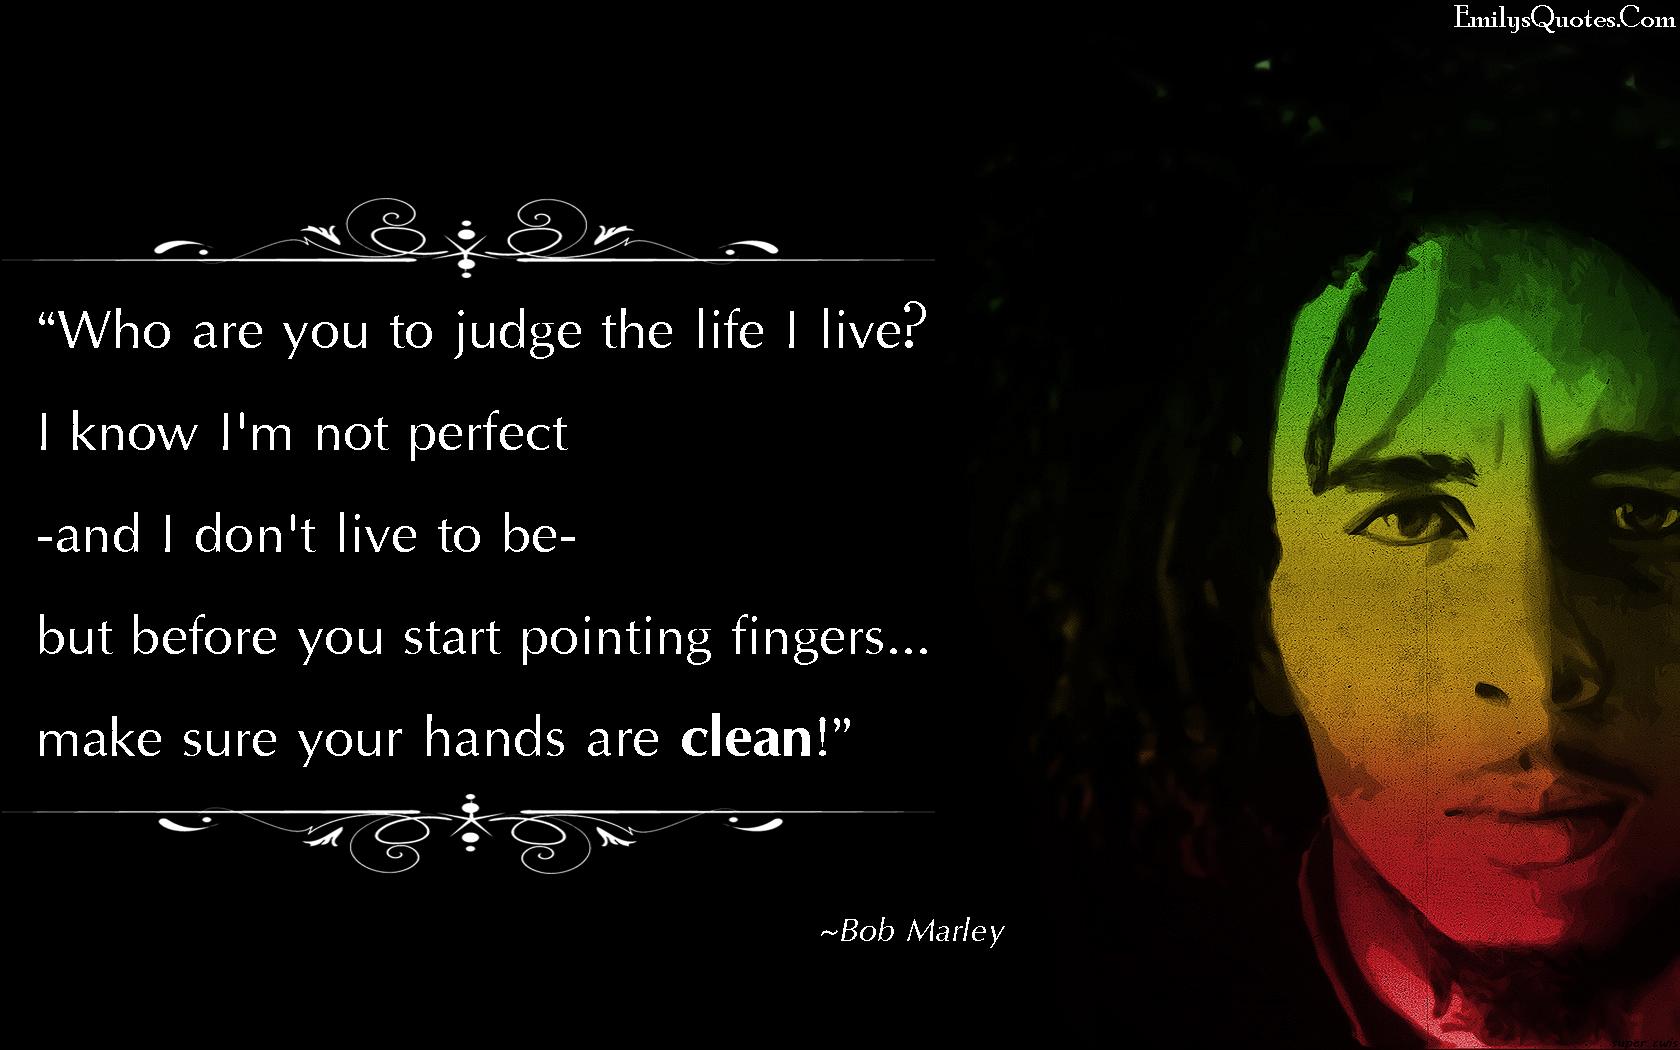 Let Quote U I Just Know U Wont Judge